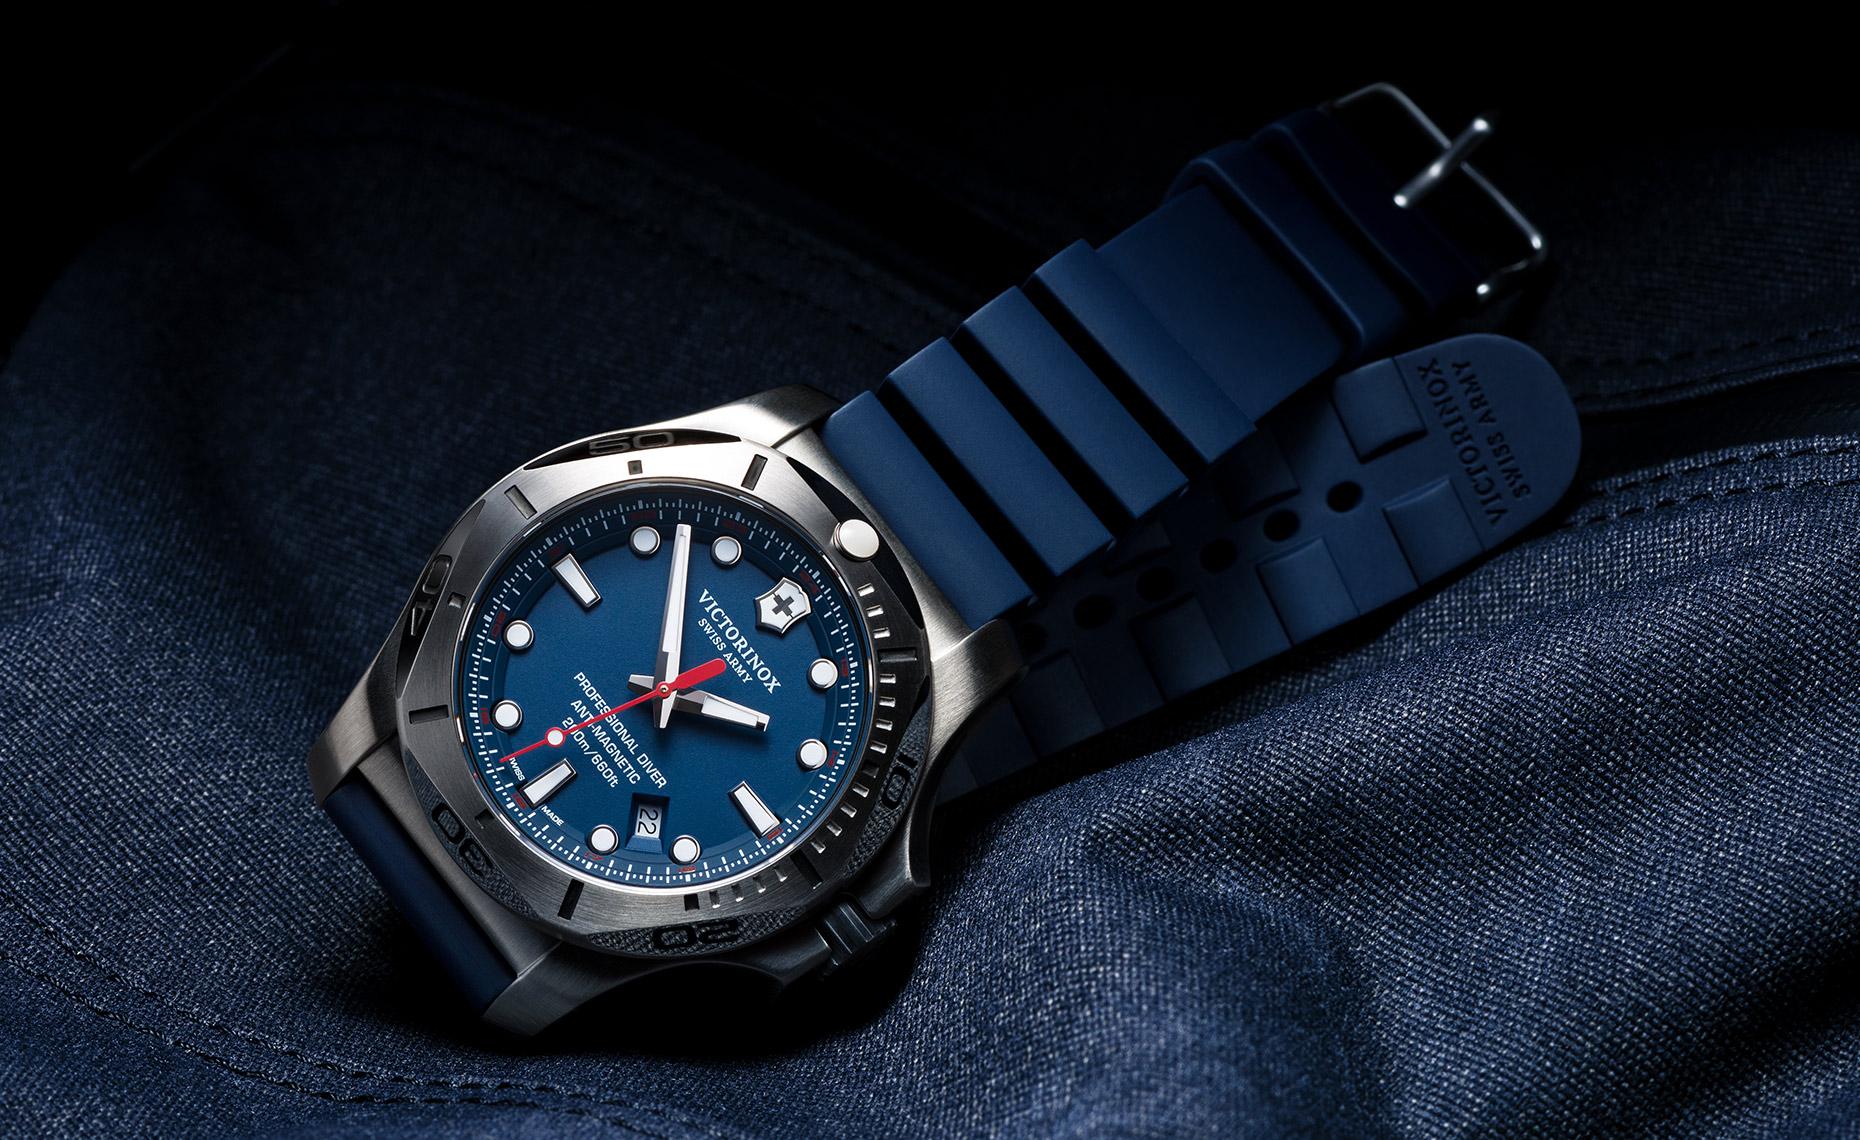 tom-medvedich-still-life-jewelry-watches-victorinox-inox-navy-01.jpg